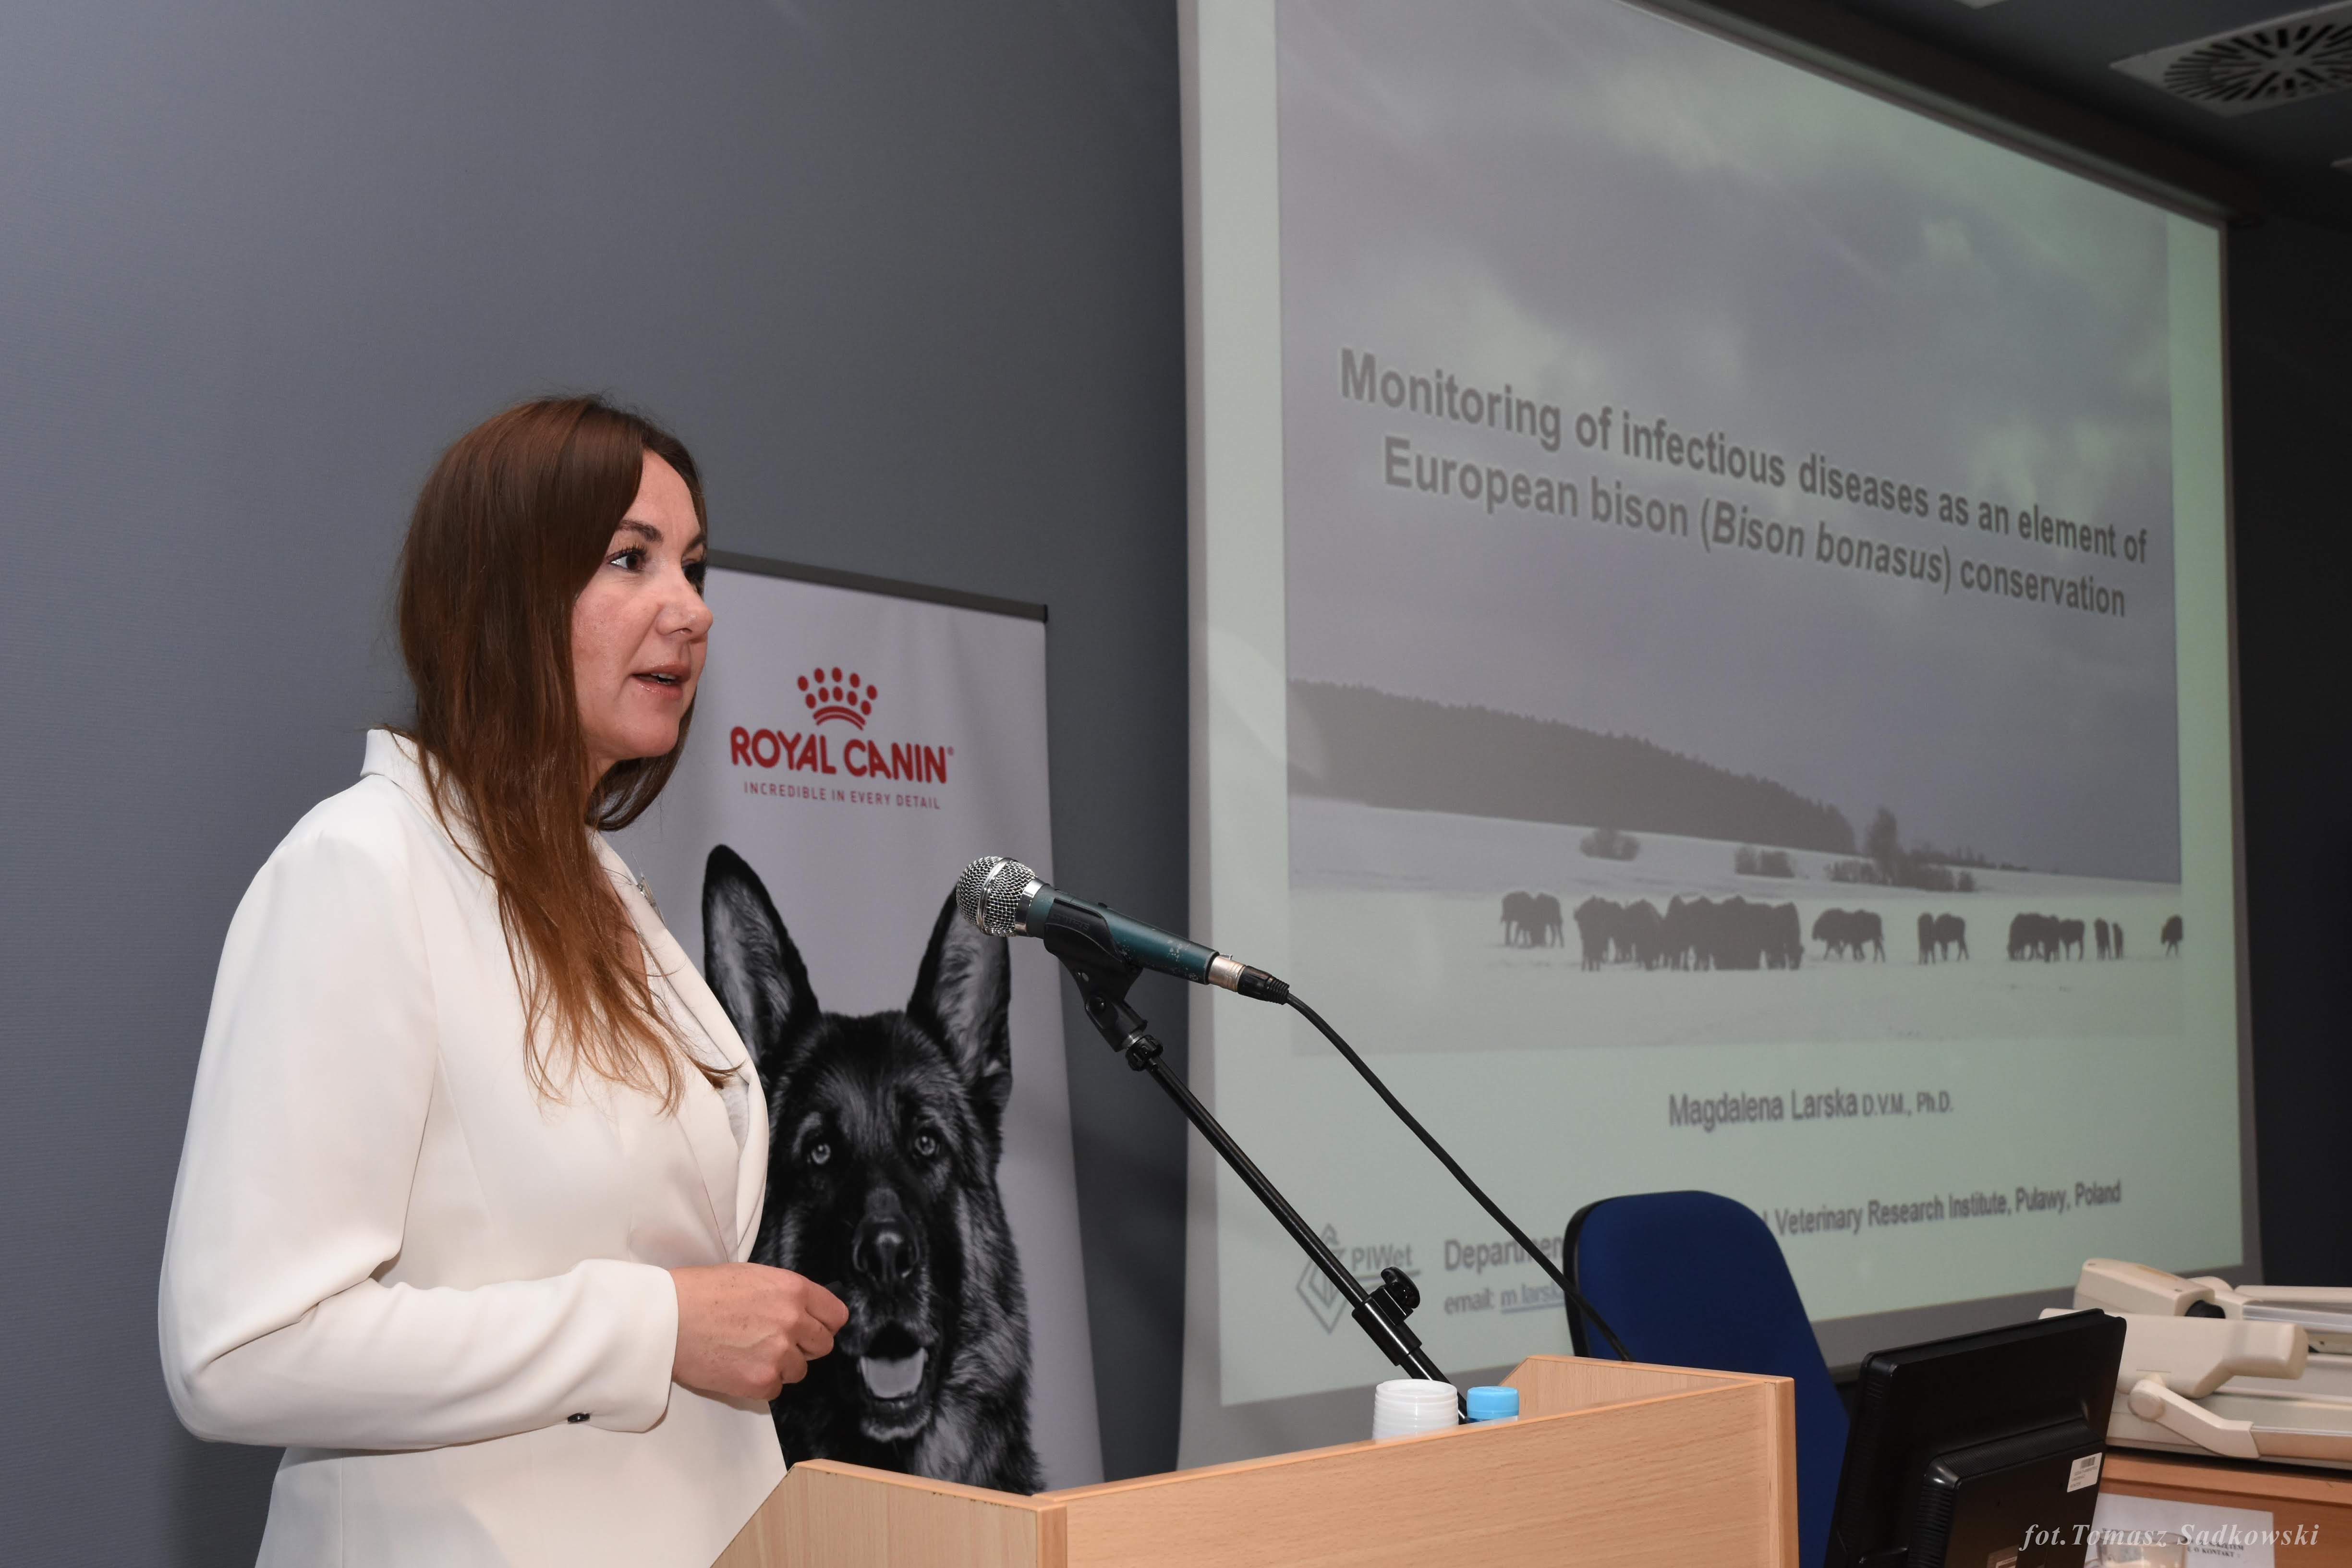 Professor Magdalena Larska